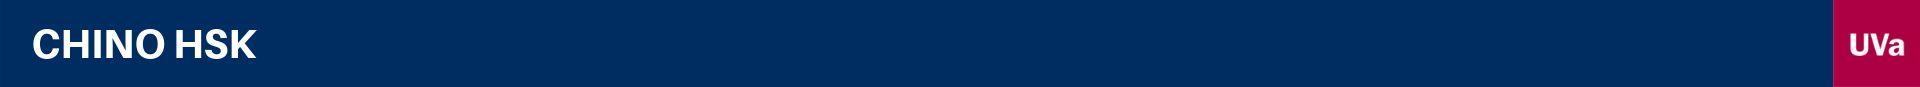 Chino banner cursos web